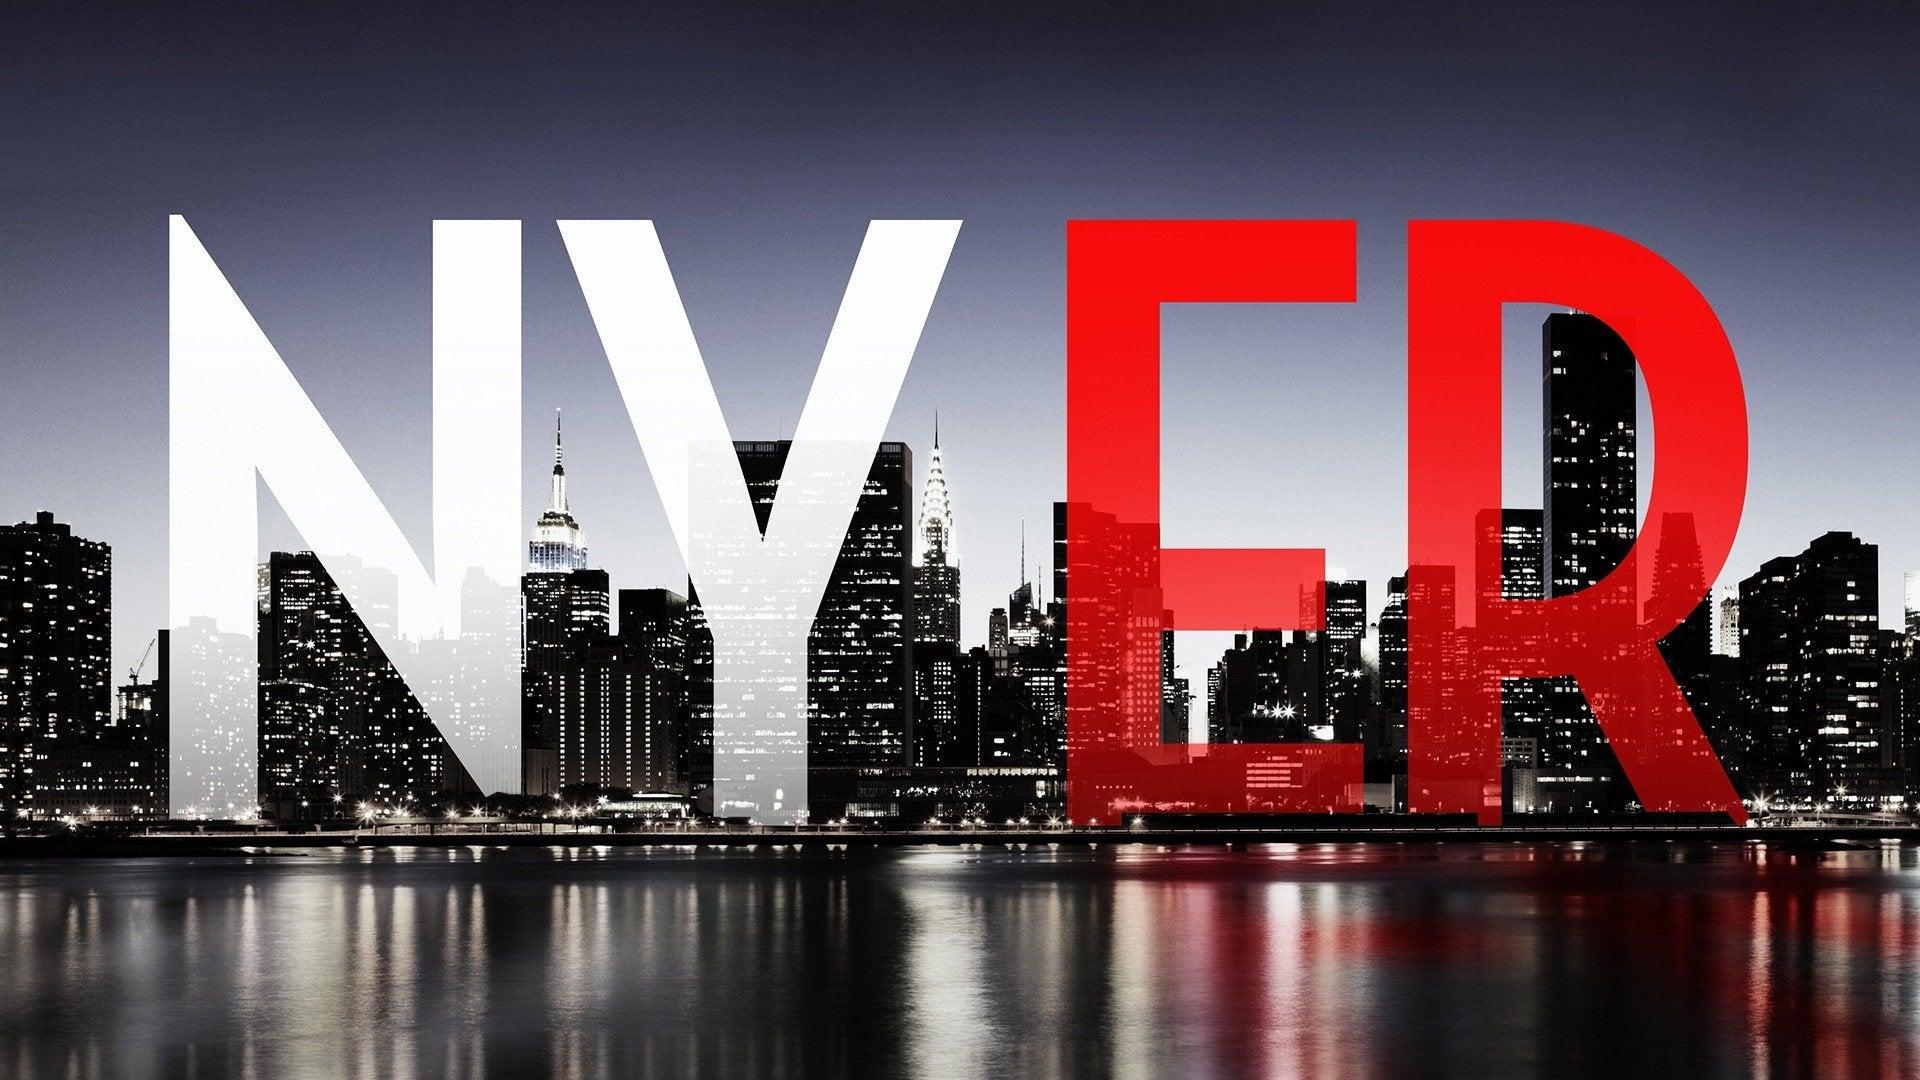 NY ER